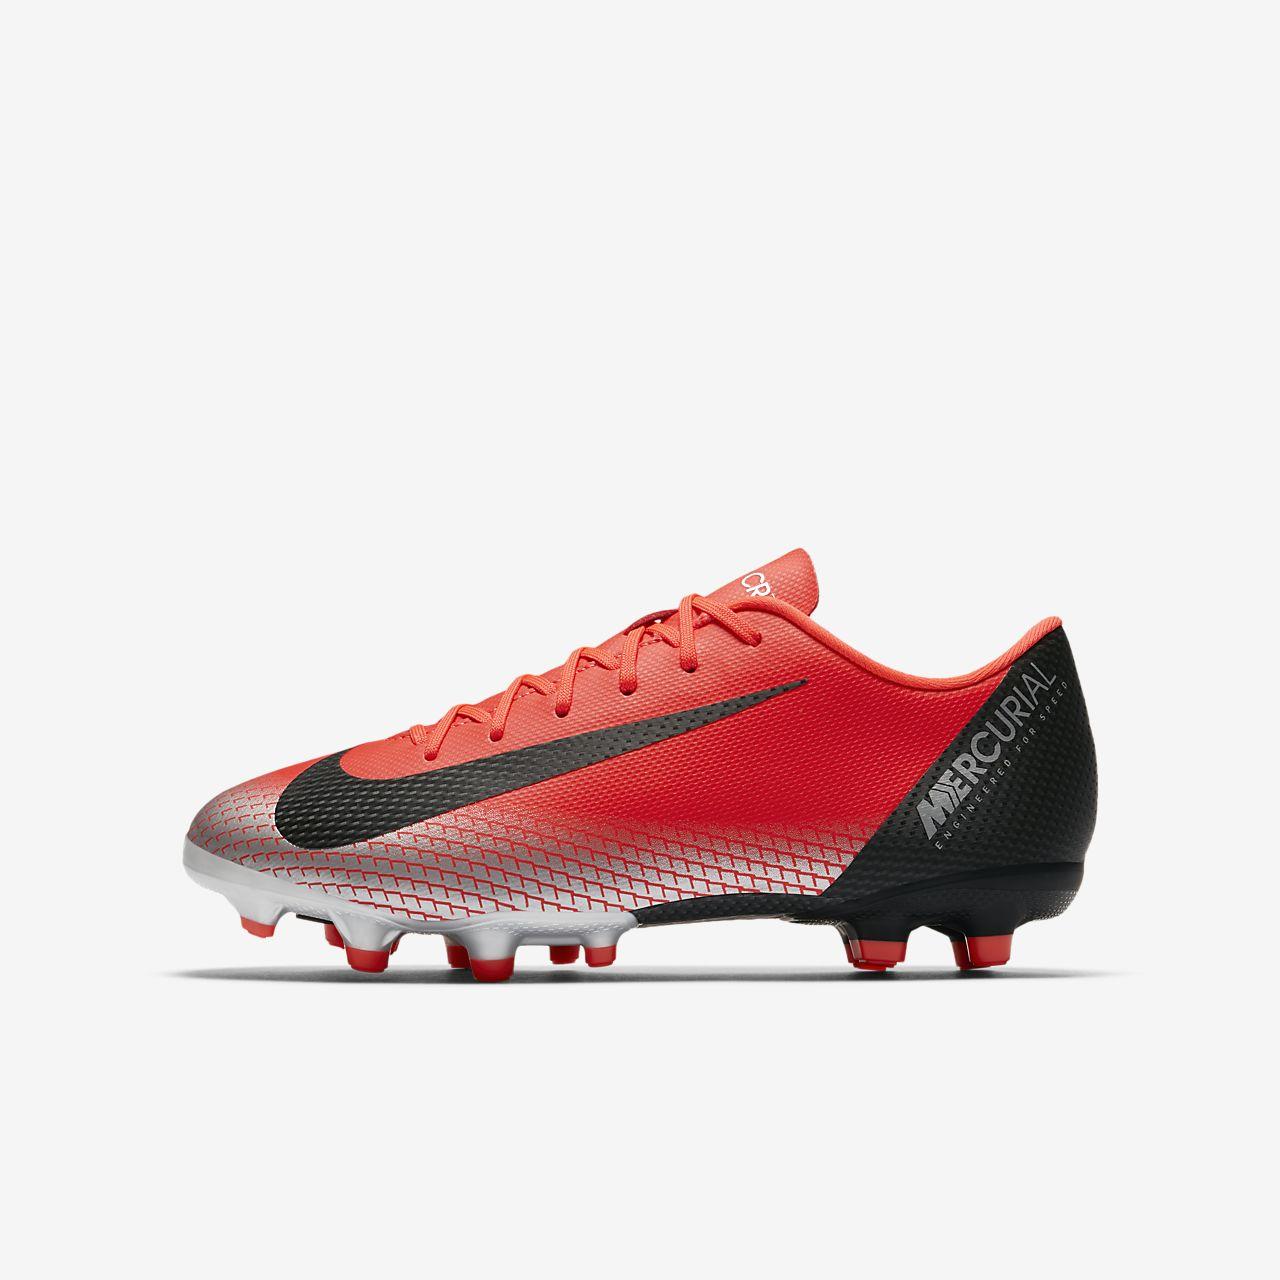 pretty nice f2ea1 69cd9 ... Chaussure de football multi-terrains à crampons Nike Jr. Mercurial  Vapor XII Academy CR7